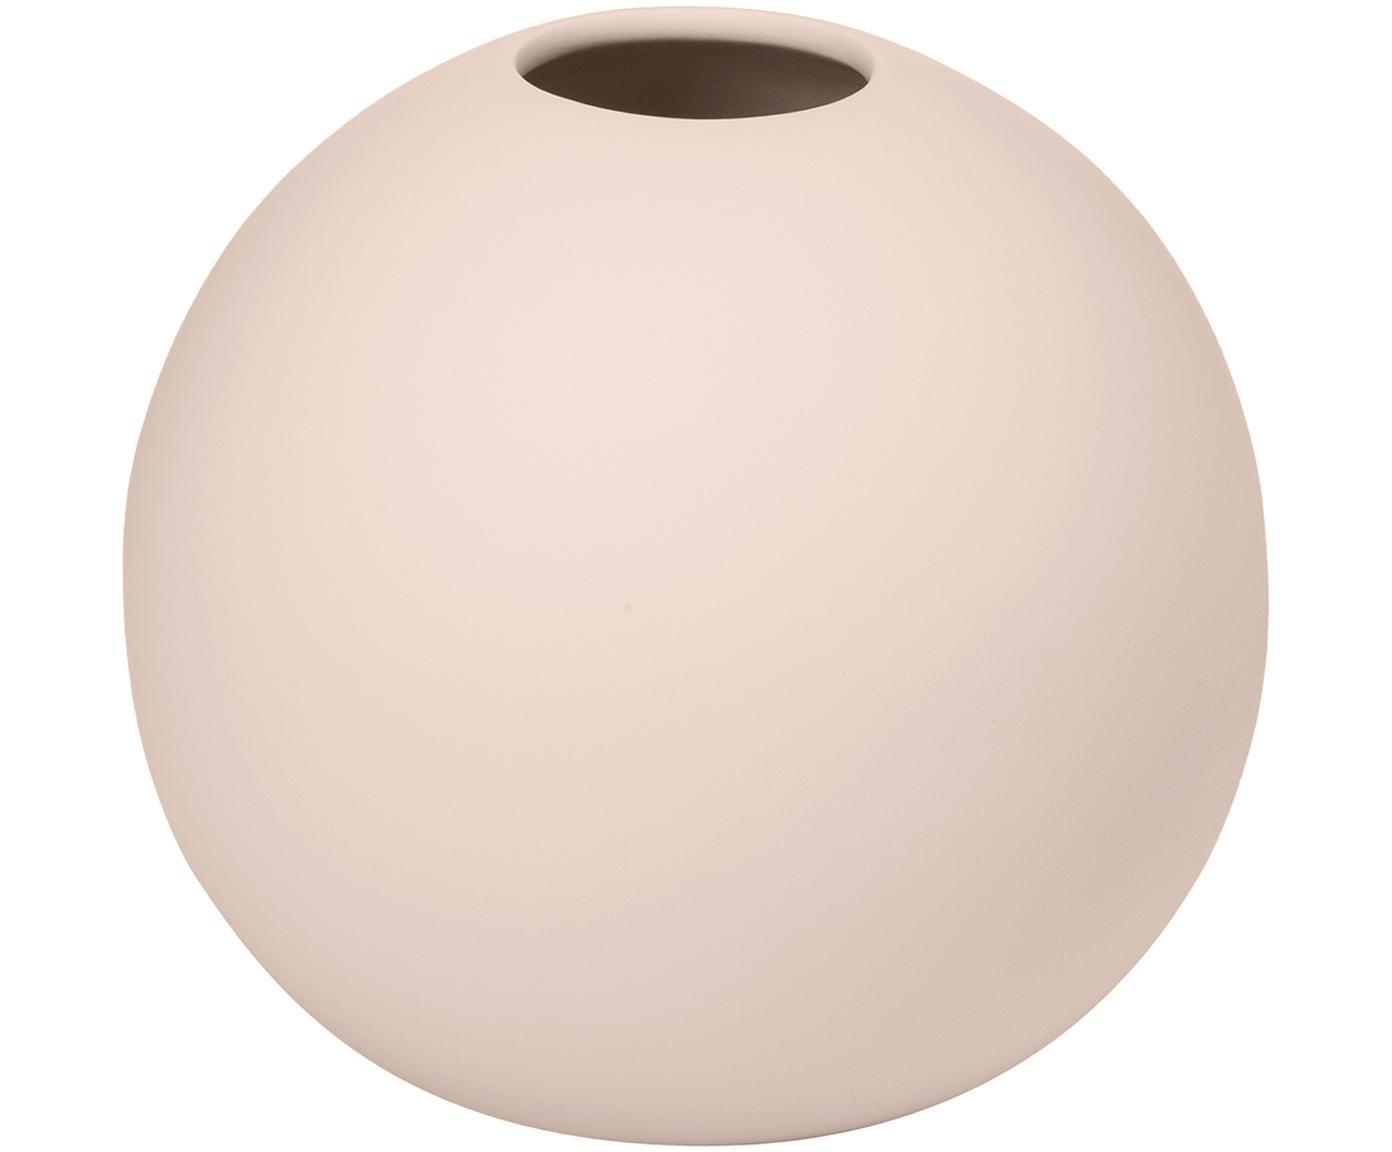 Handgemaakte bollen vaas Ball, Keramiek, Roze, Ø 10 x H 10 cm